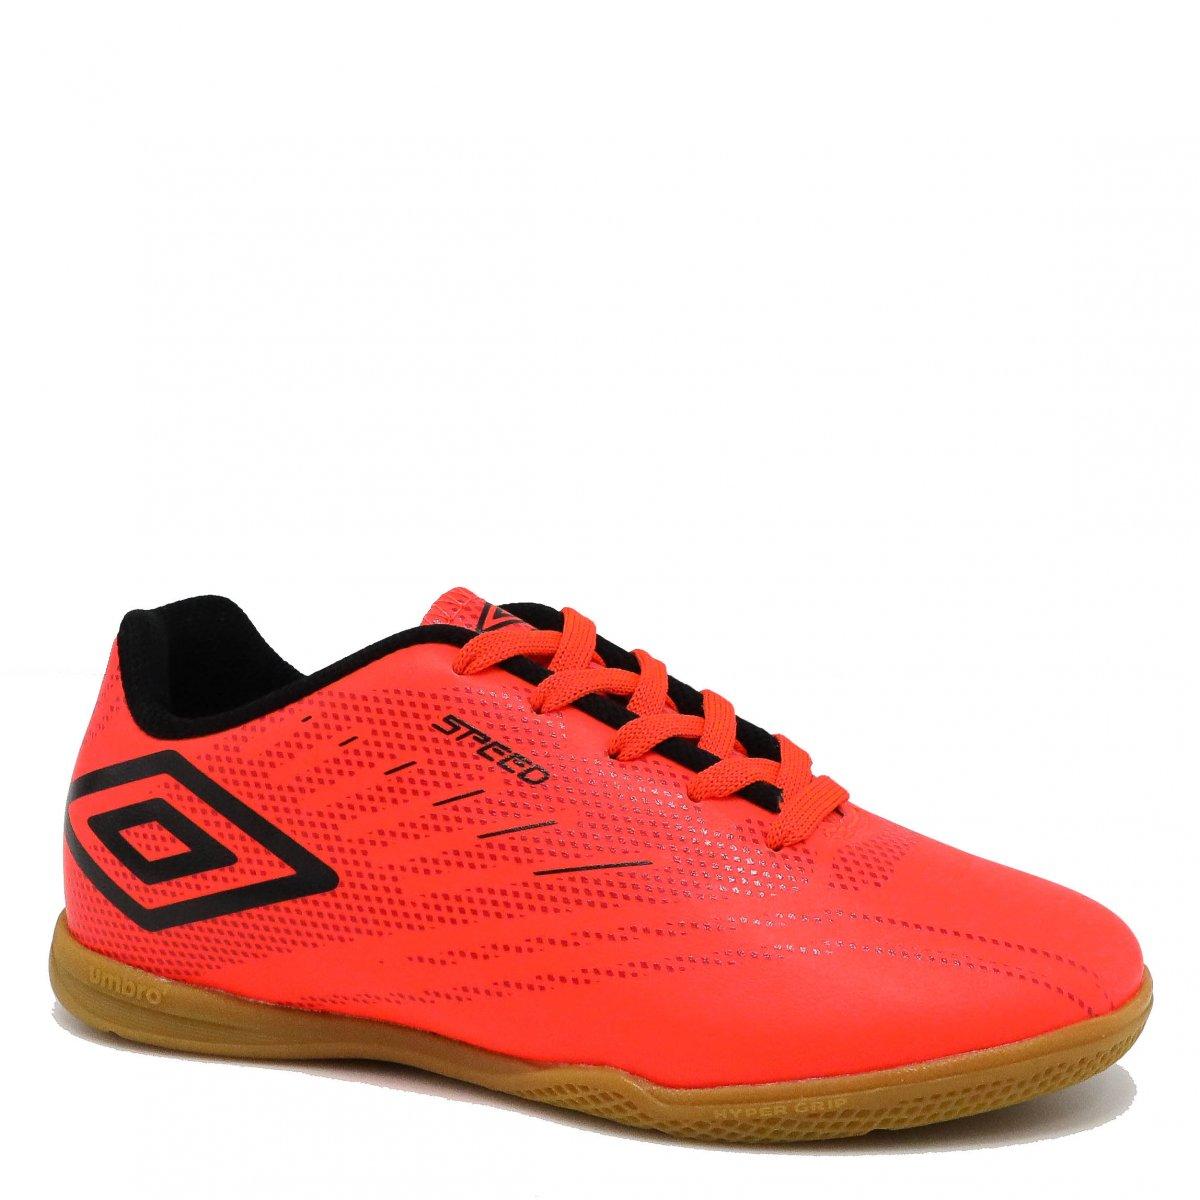 d4c768e5b9 Chuteira Umbro Indoor Futsal SPEDD IV JR